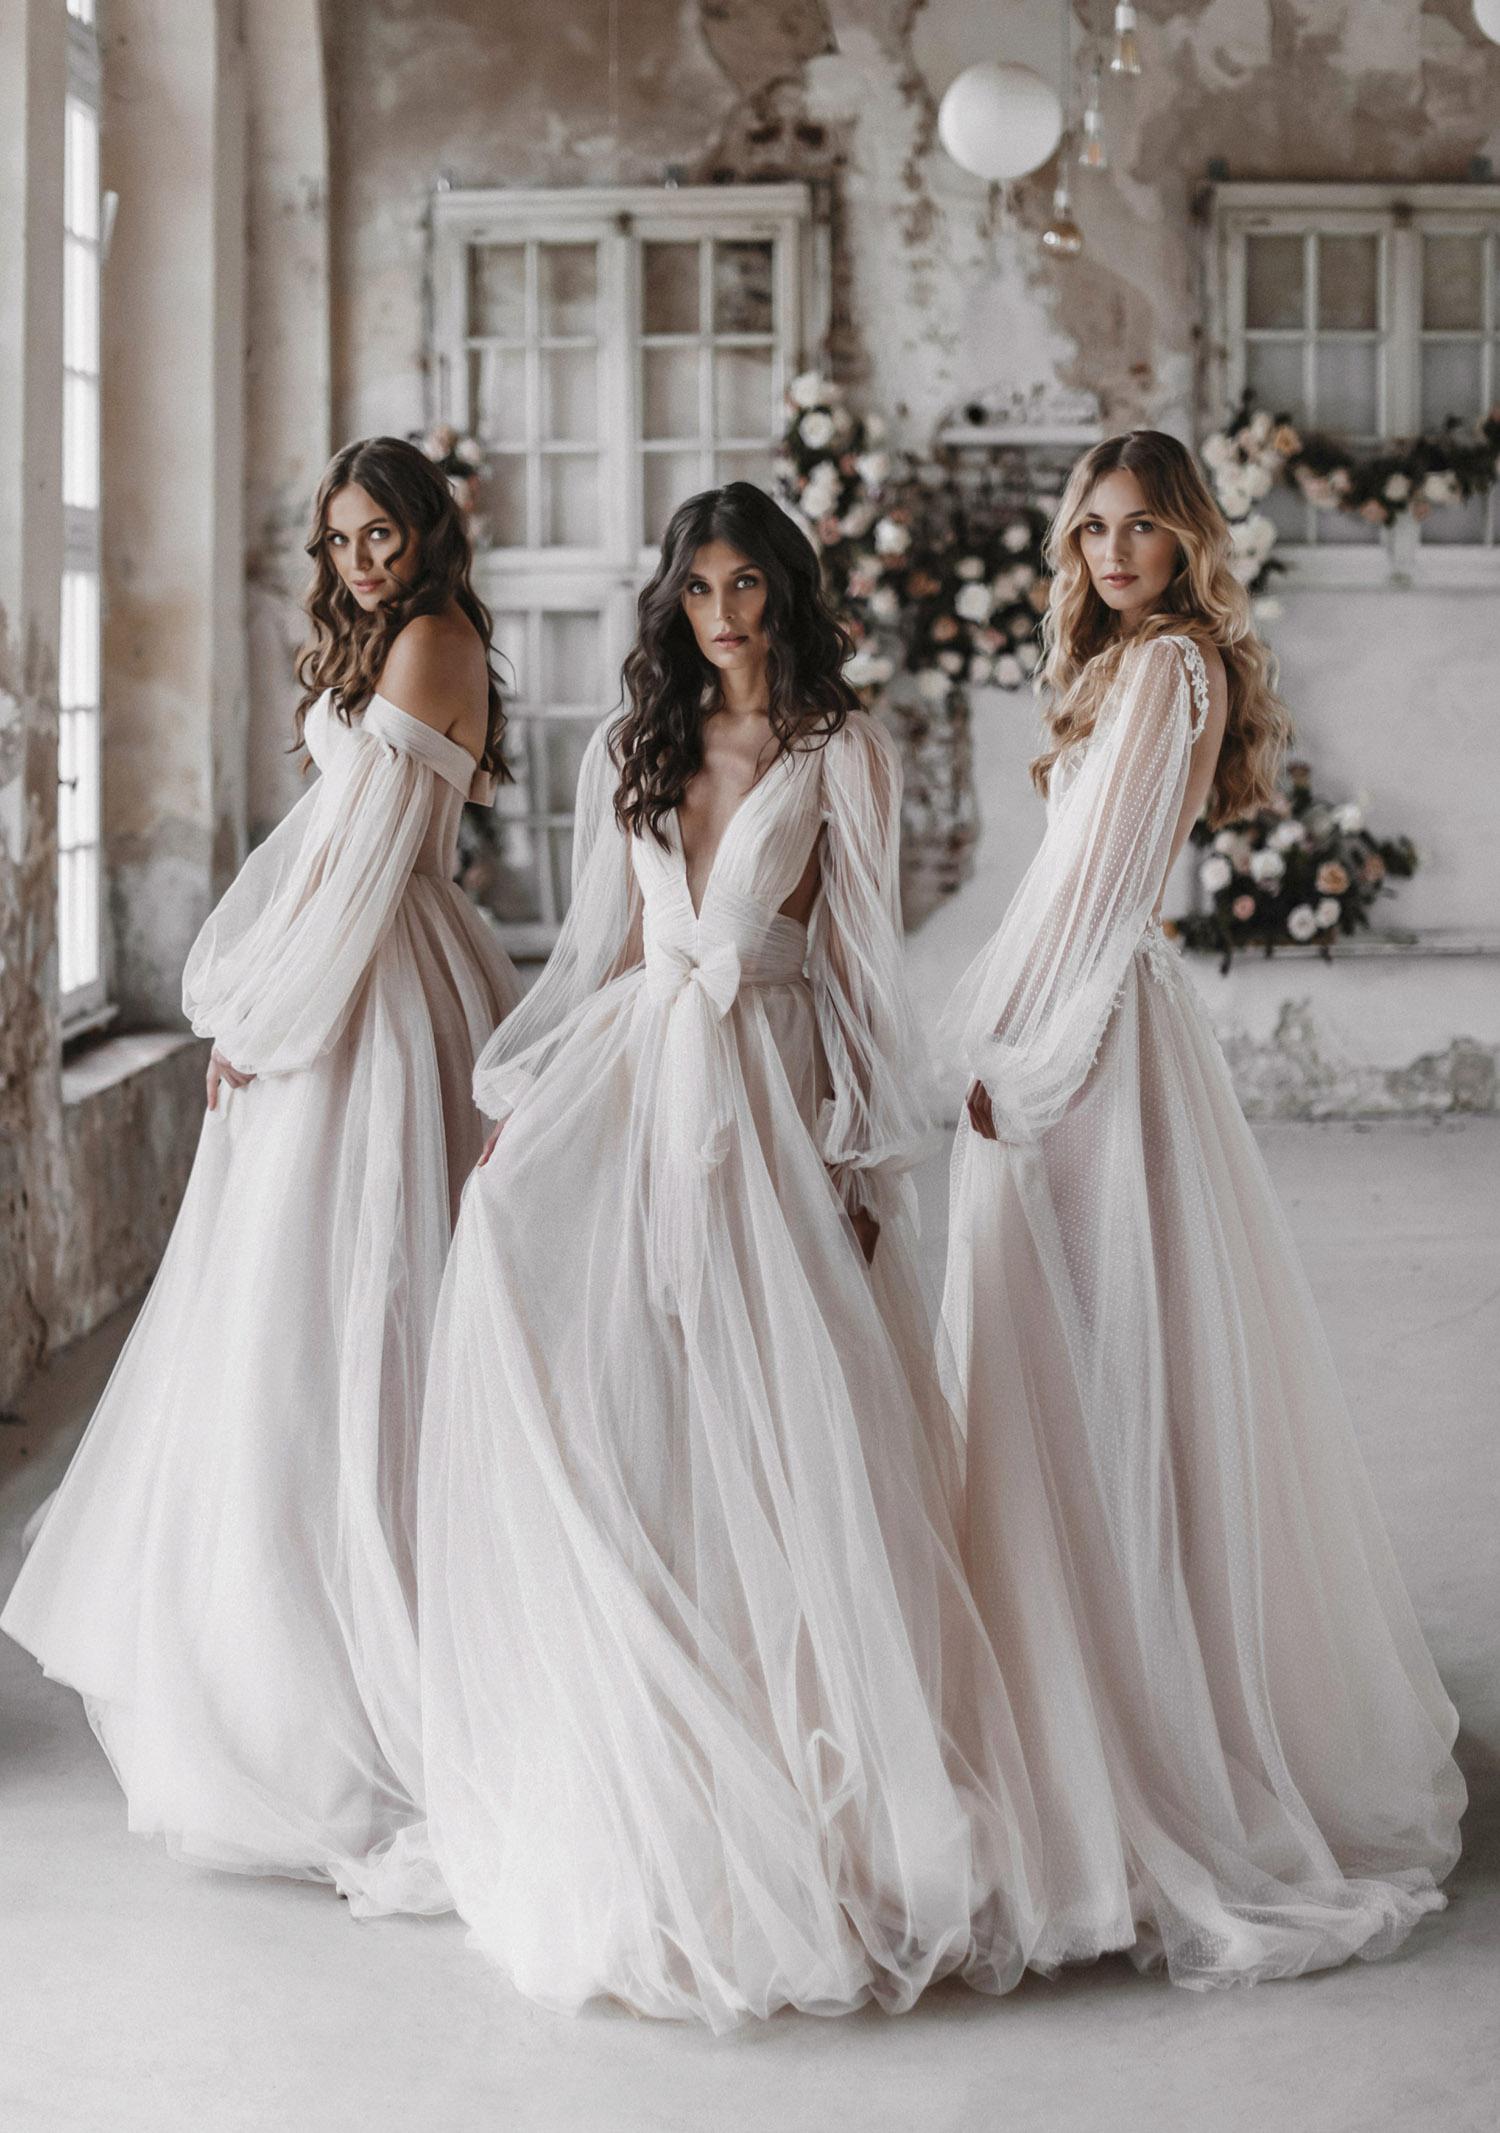 Galia Lahav Wedding Dress Collection with Tali Photography